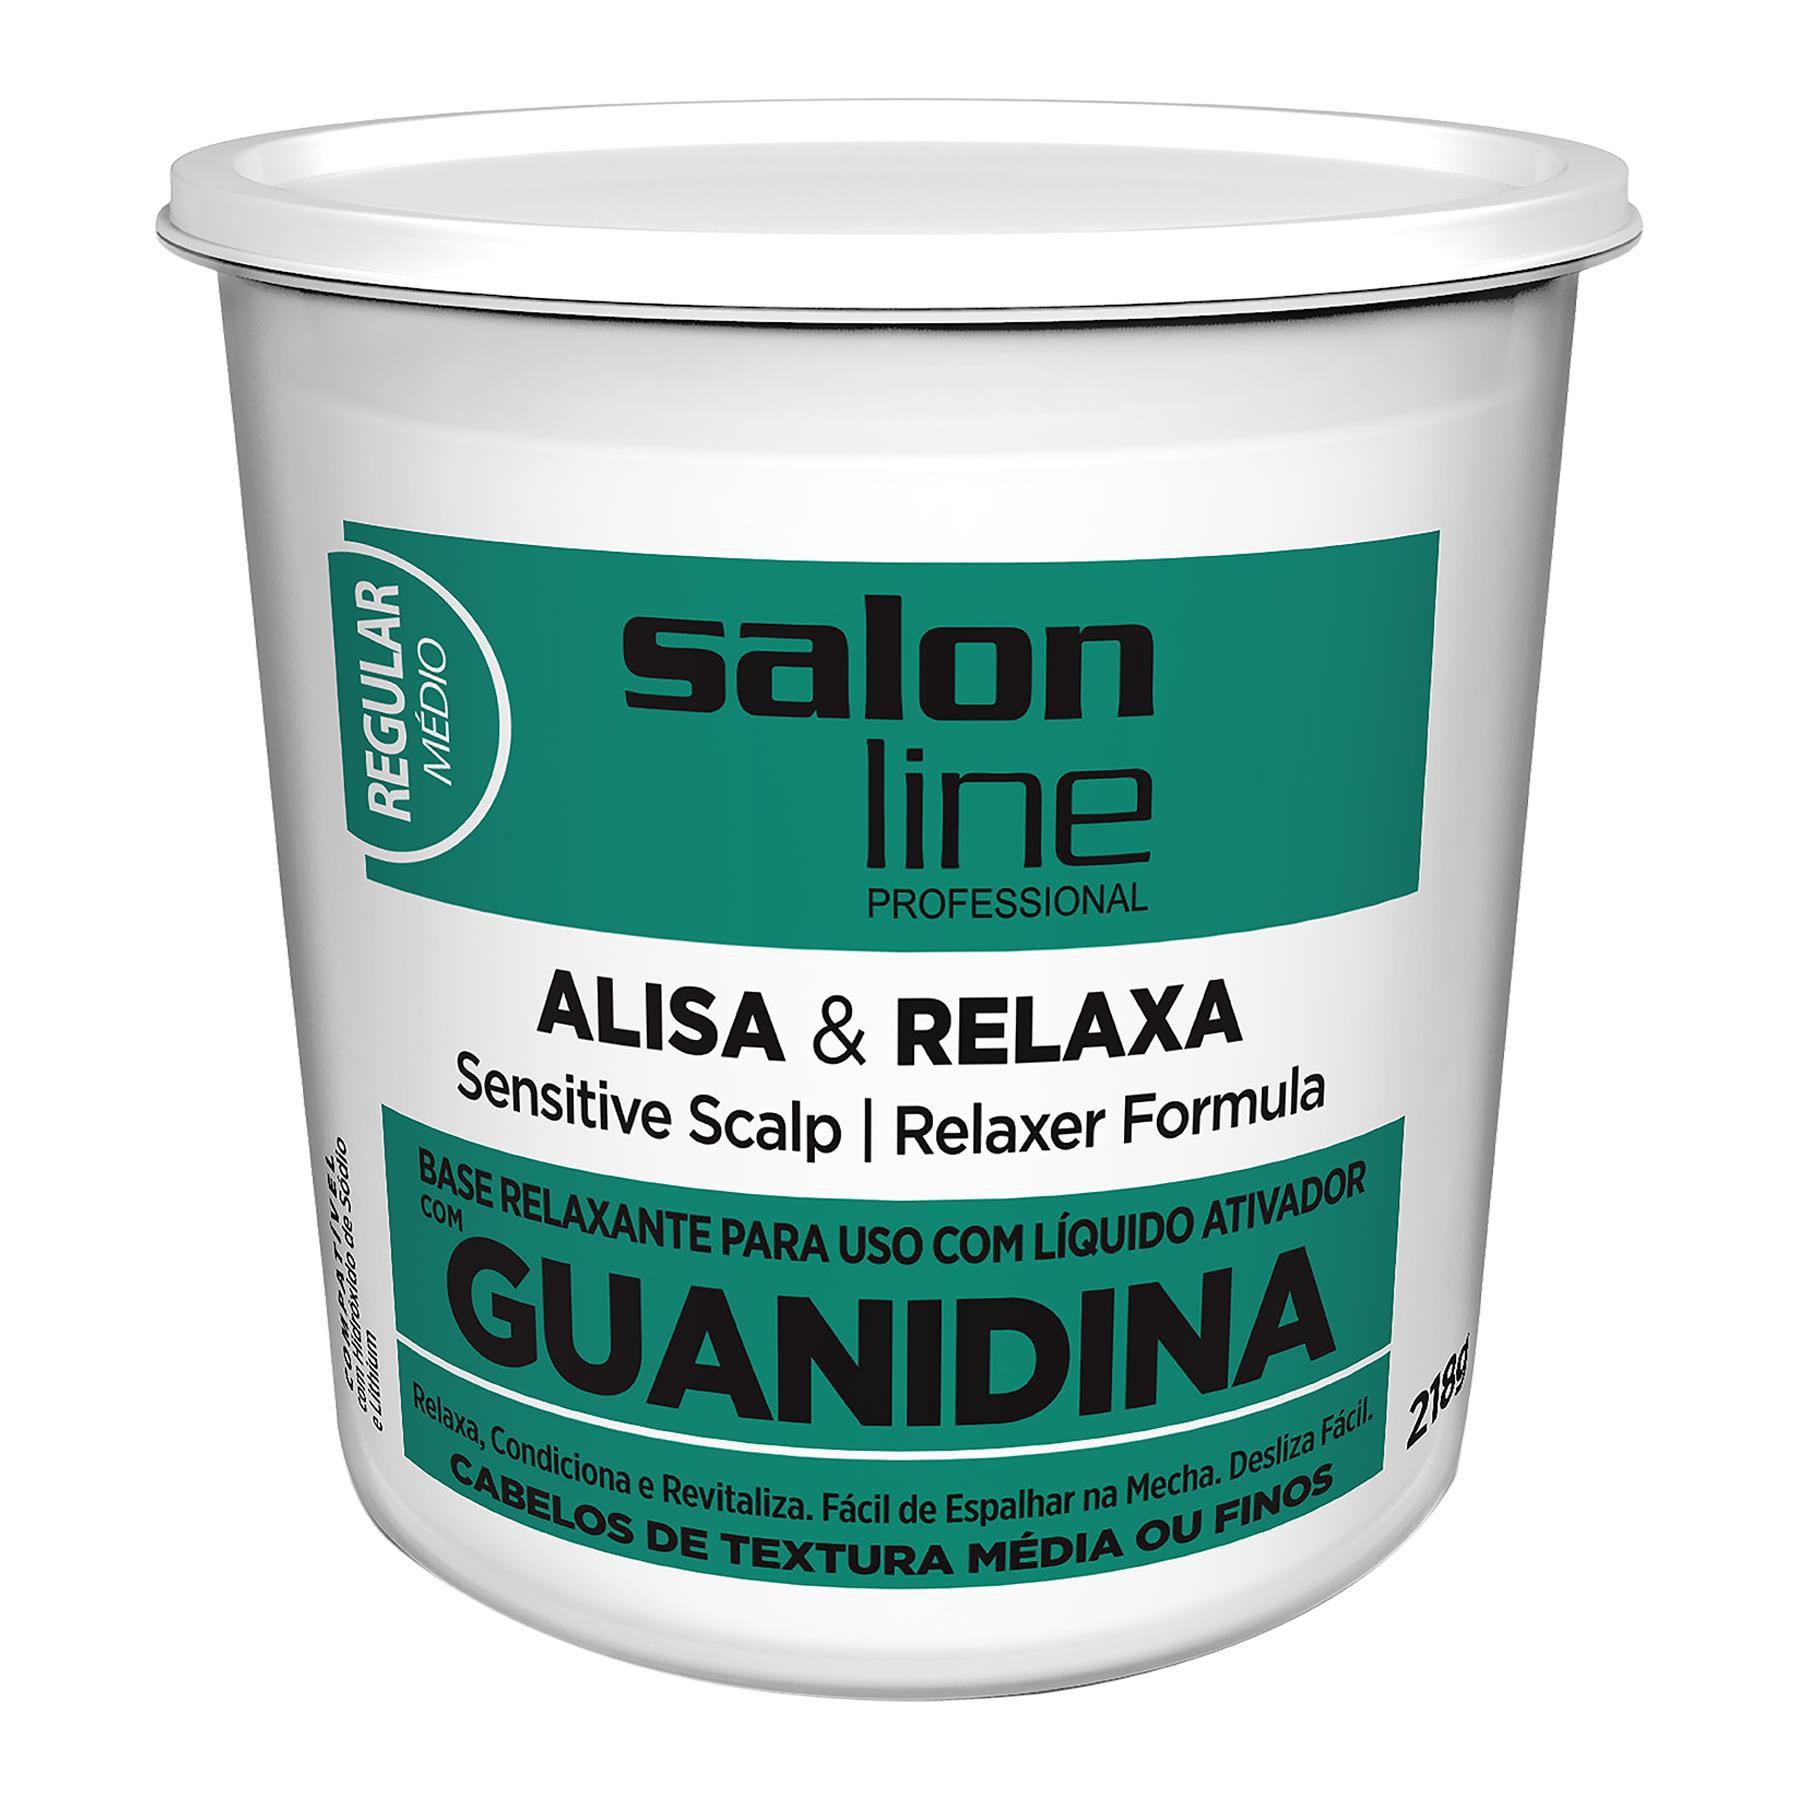 Salon Line Base Relaxante de Guadinina Alisa & Relaxa Regular 215g